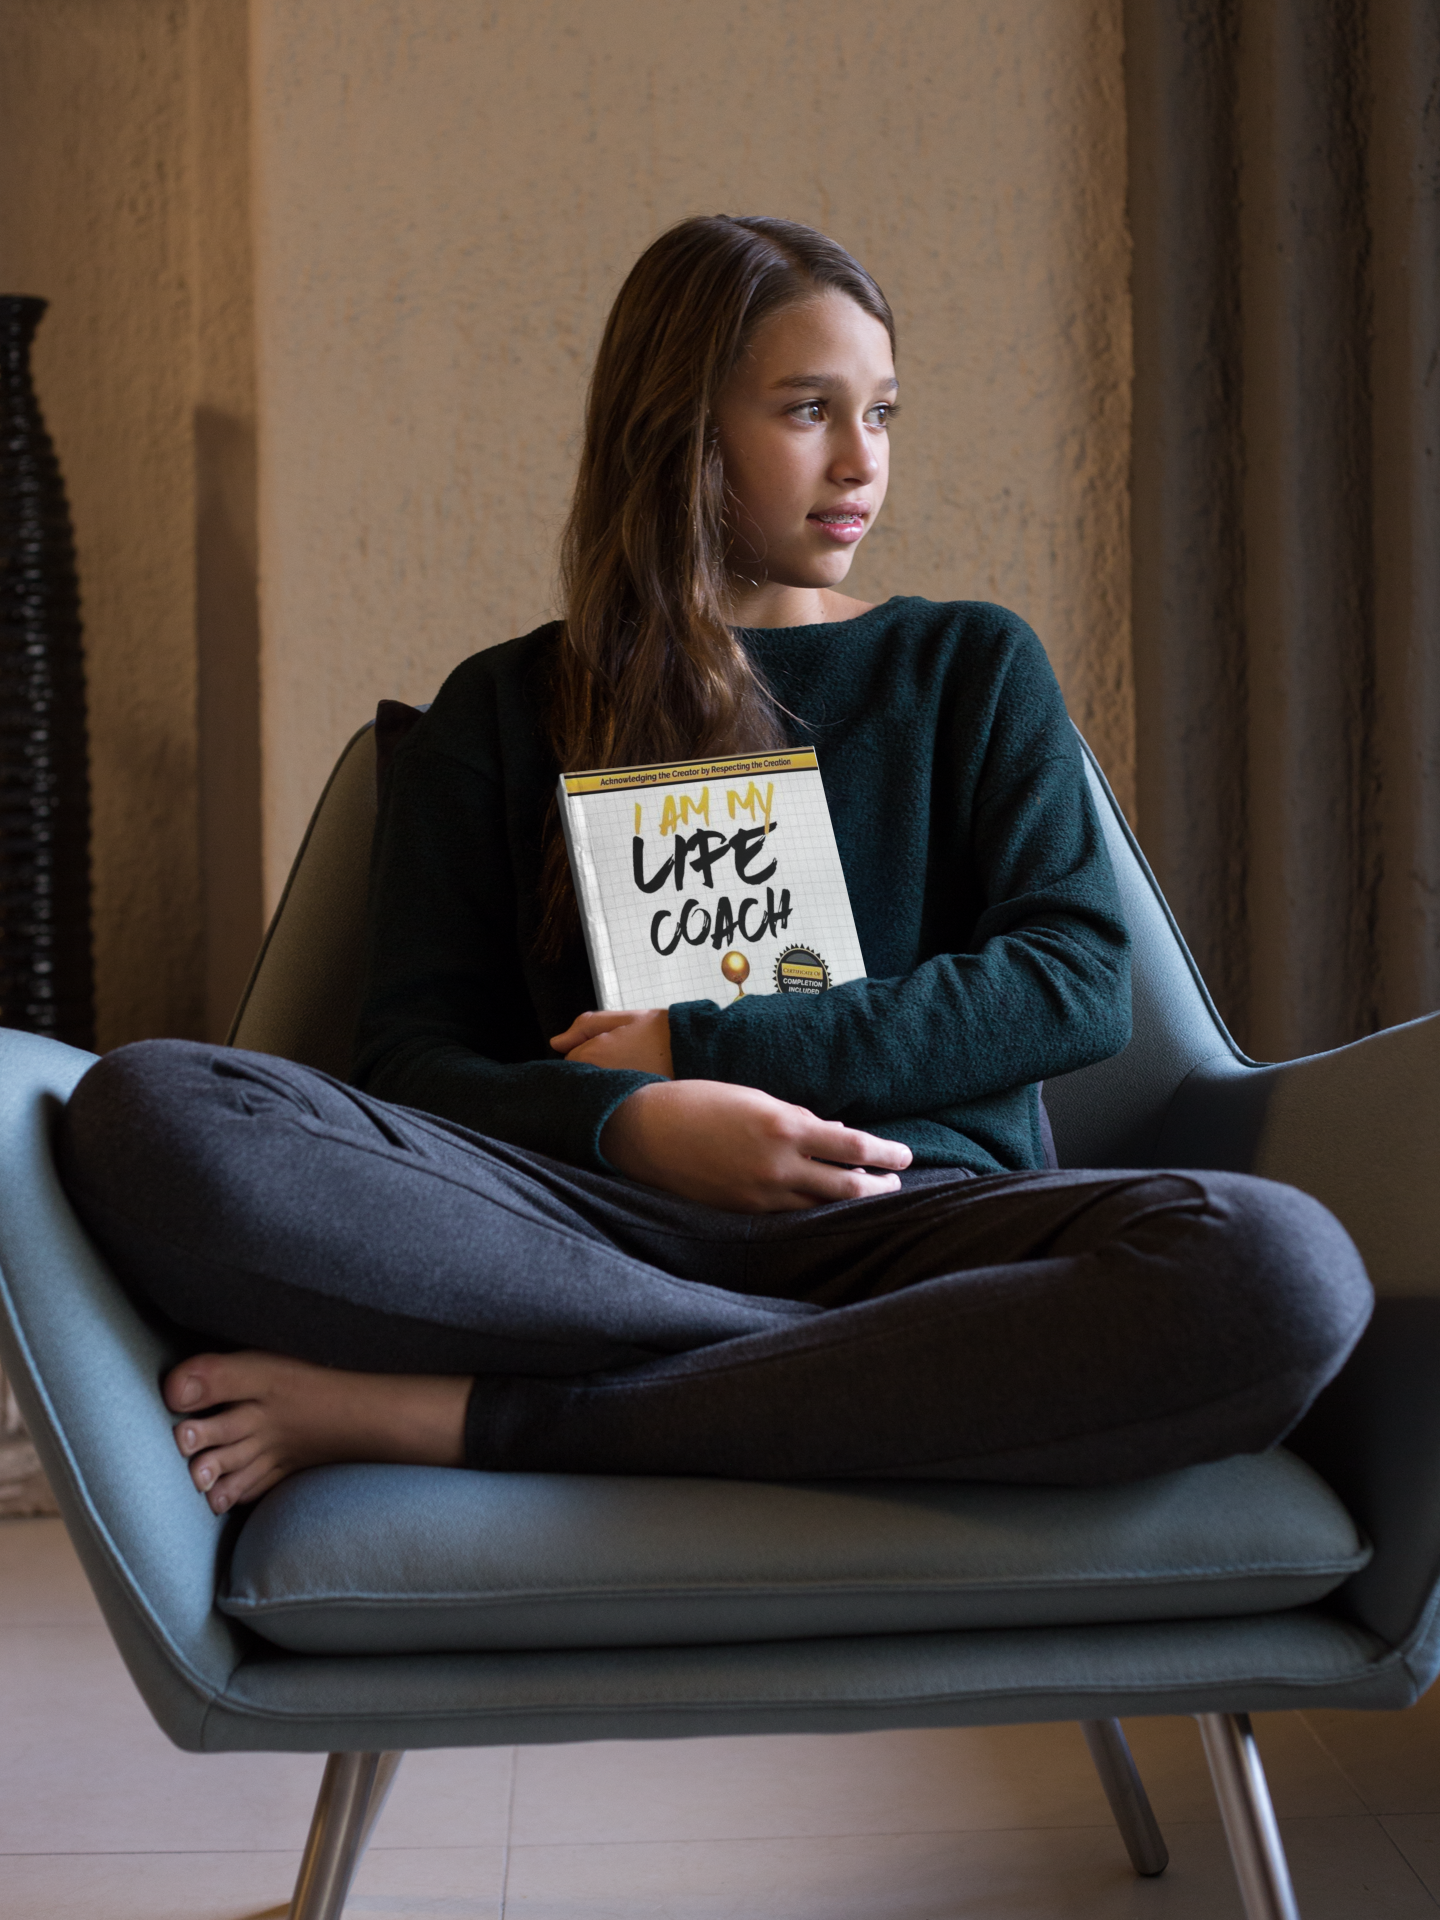 Holding Book – Mental Health – I Am My Life Coach